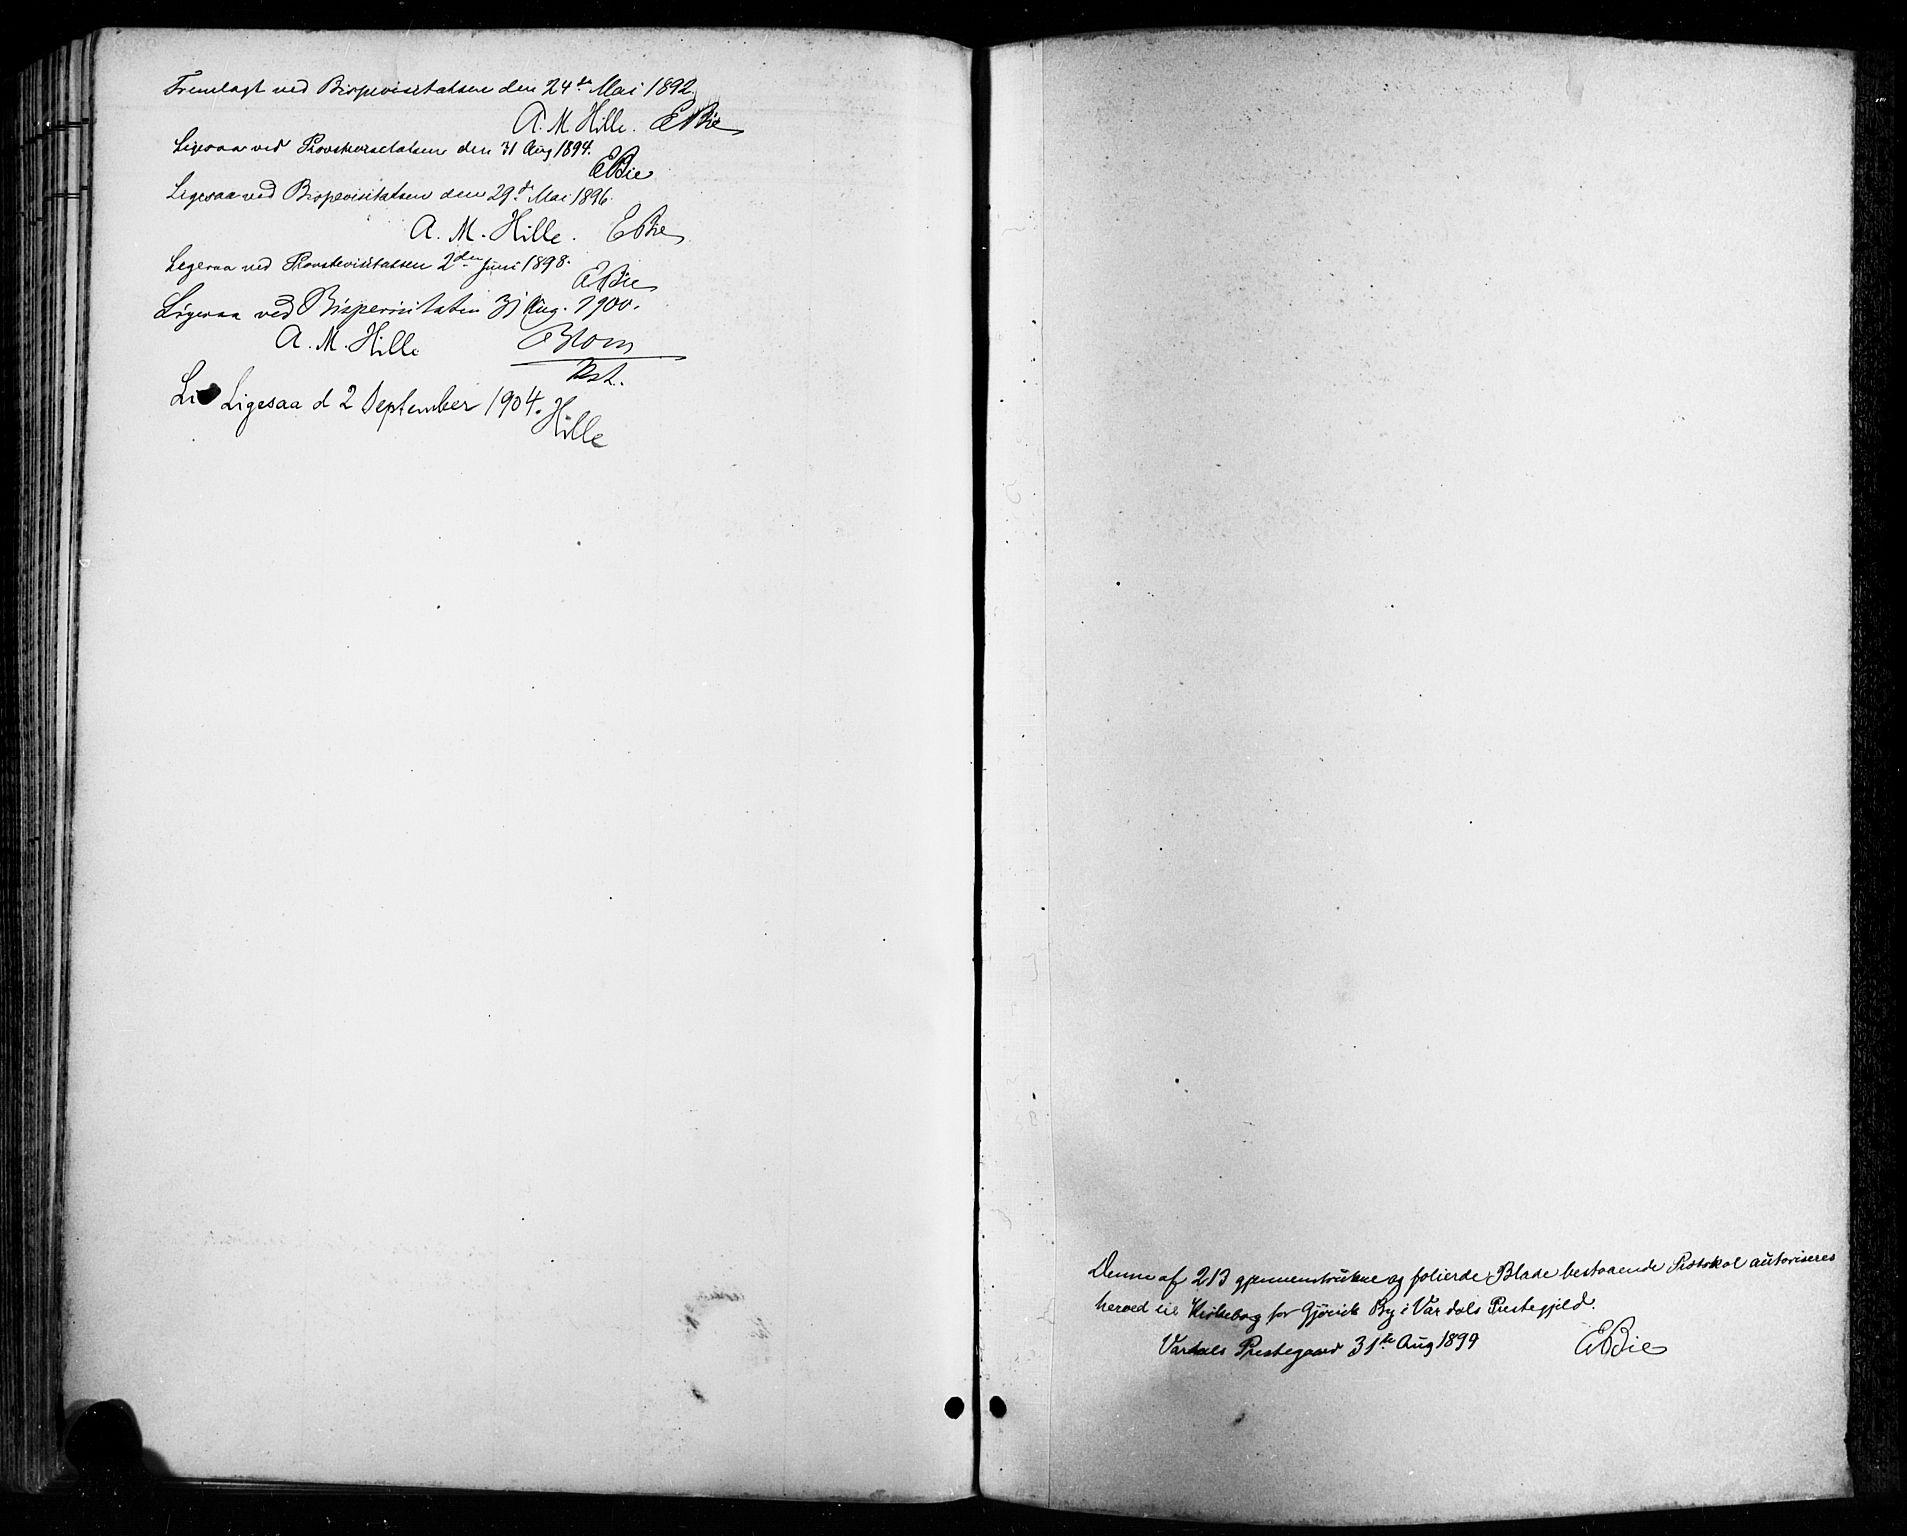 SAH, Vardal prestekontor, H/Ha/Haa/L0011: Ministerialbok nr. 11, 1891-1901